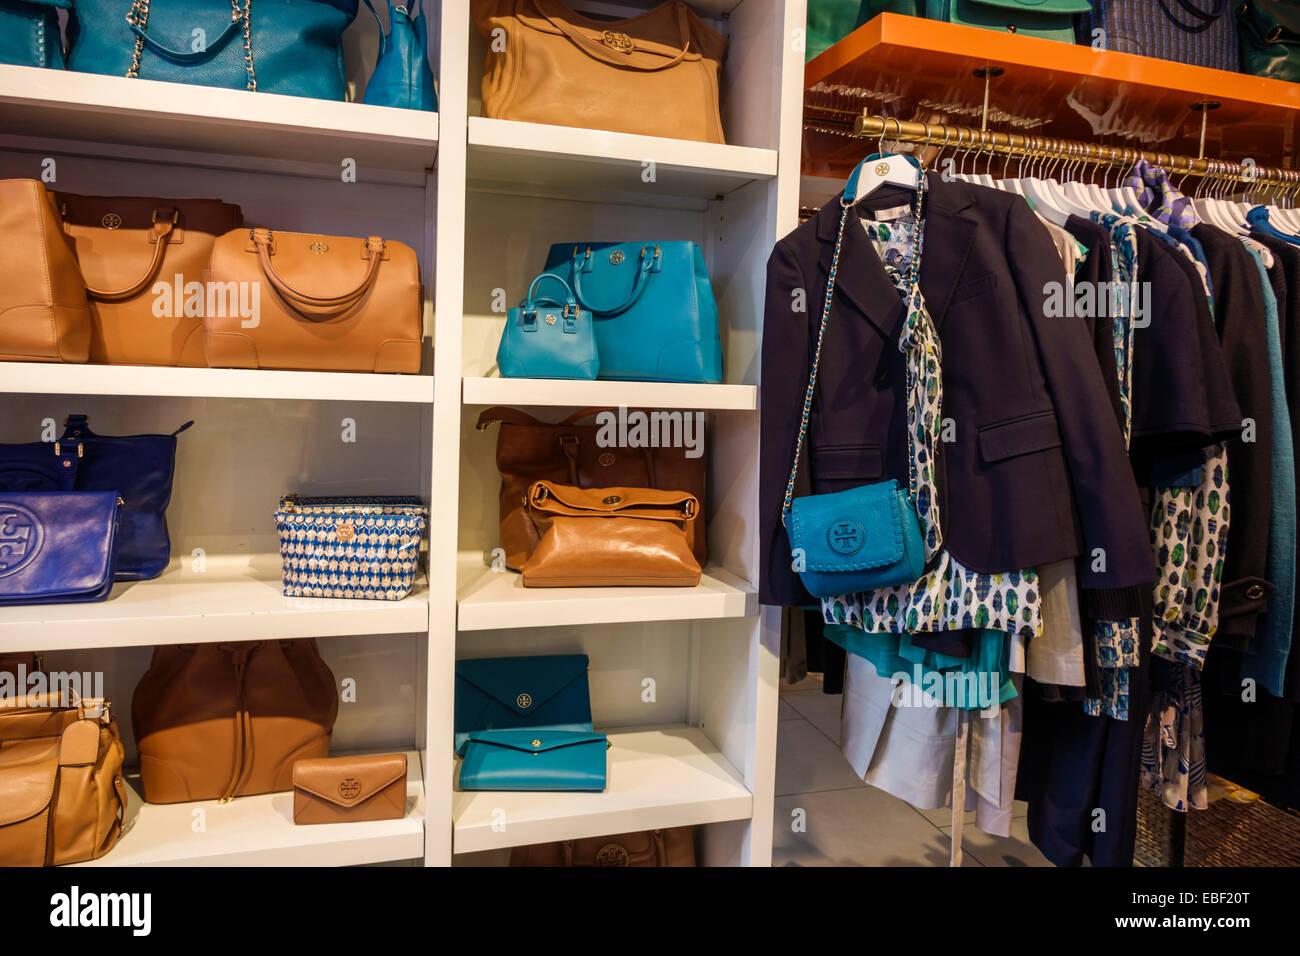 aa3798cd642 Orlando Florida Premium Outlets shopping Tory Burch designer display sale  women s handbags clothing inside